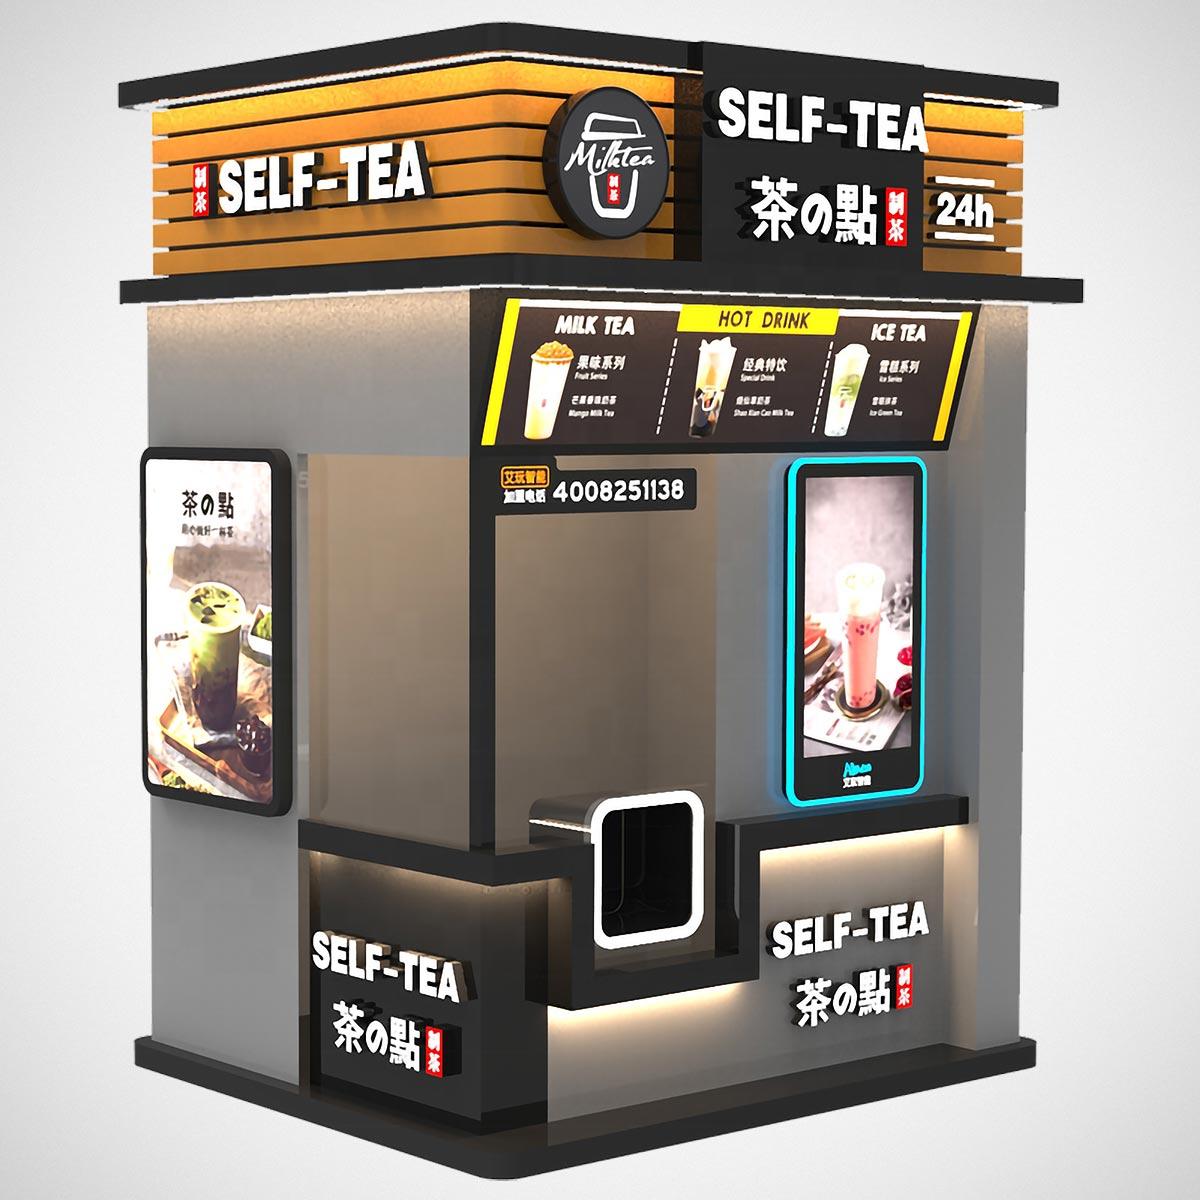 Robotic Arm Smart Milk Tea Vending Machine